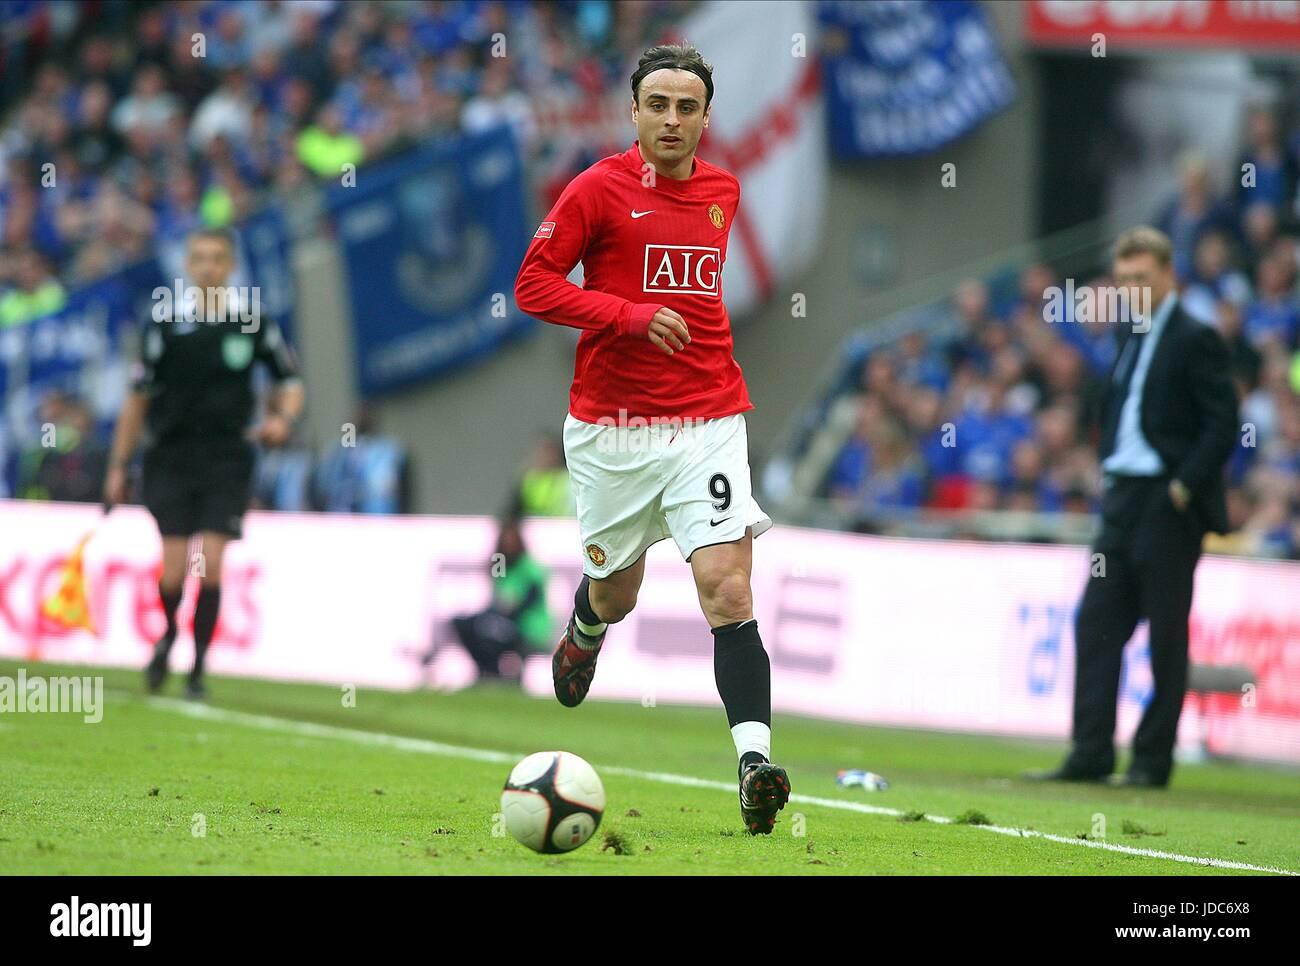 DIMITAR BERBATOV MANCHESTER UNITED FC WEMBLEY STADIUM LONDON